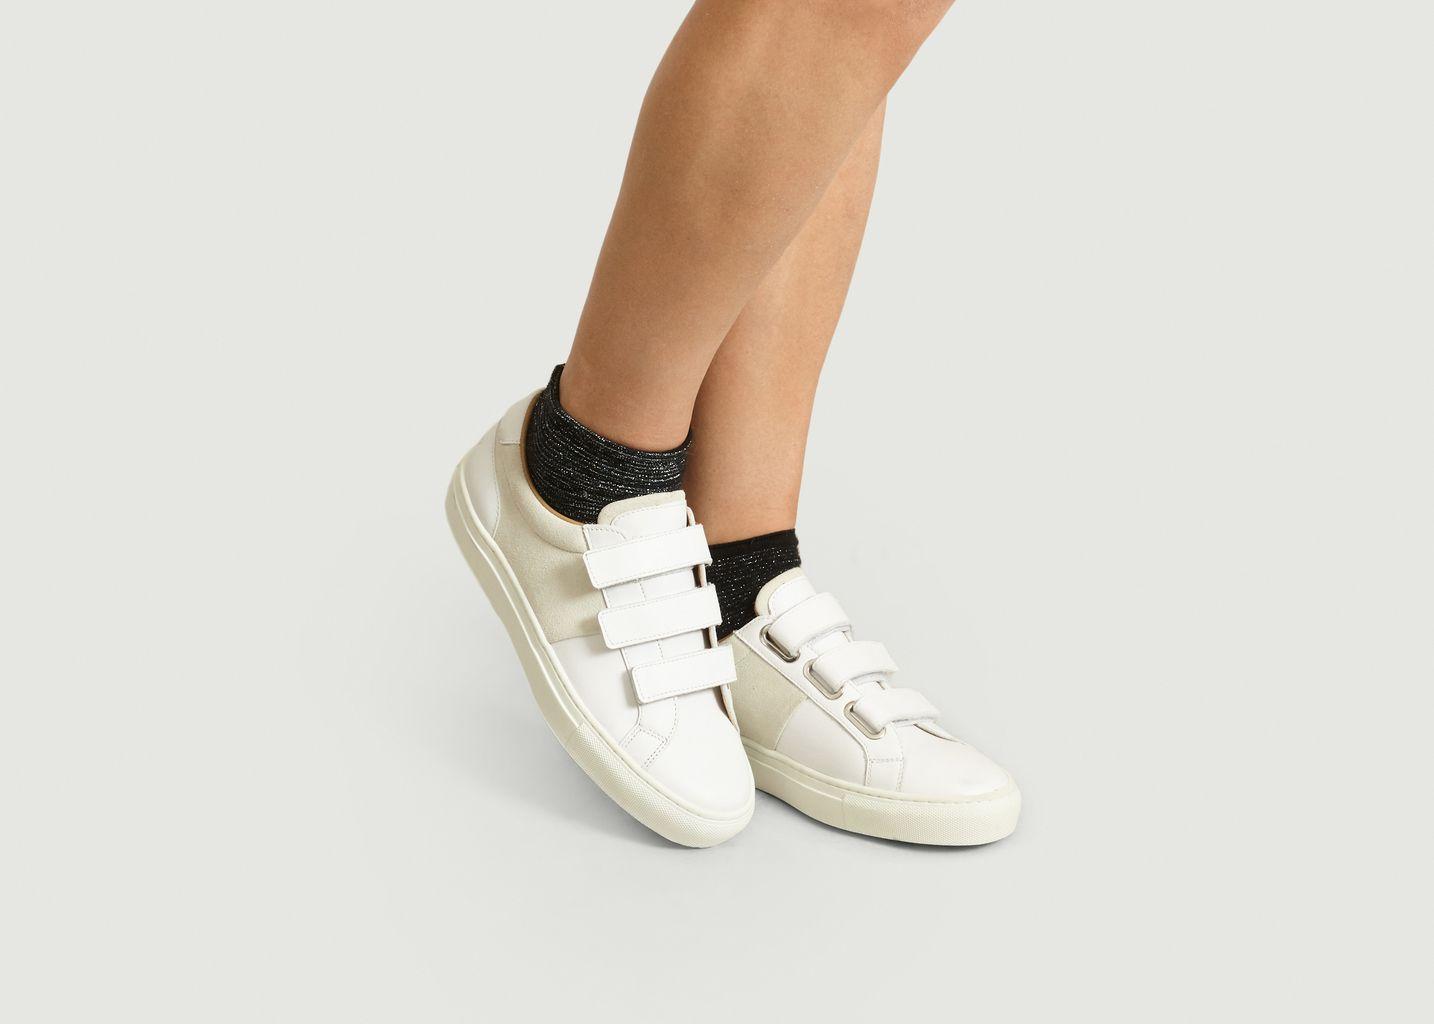 Sneakers A Scratch Jules - Canal Saint Martin